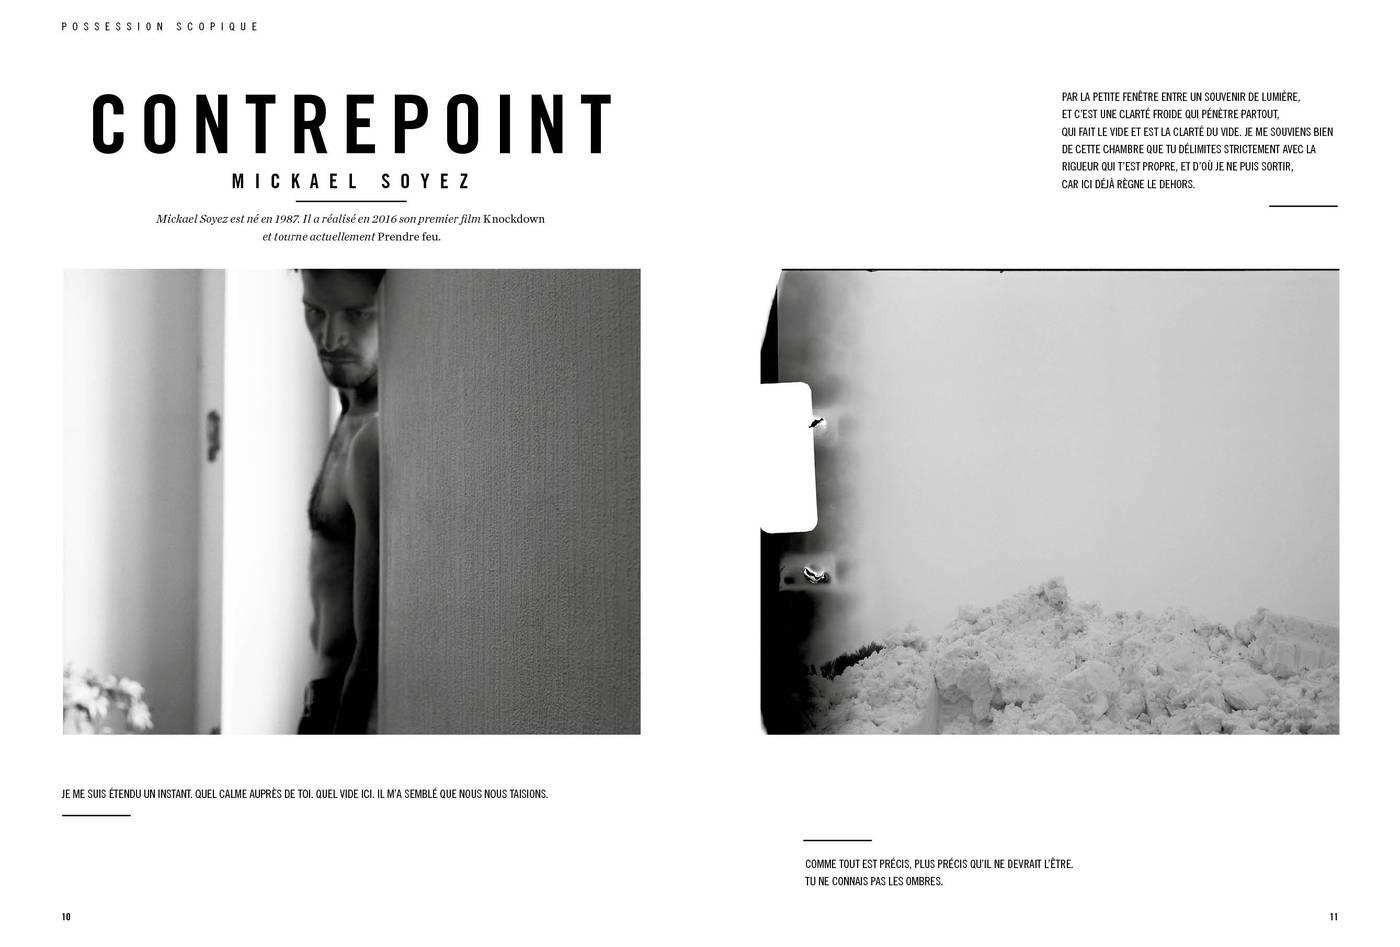 Photographies de Mickael Soyez, Contrepoint